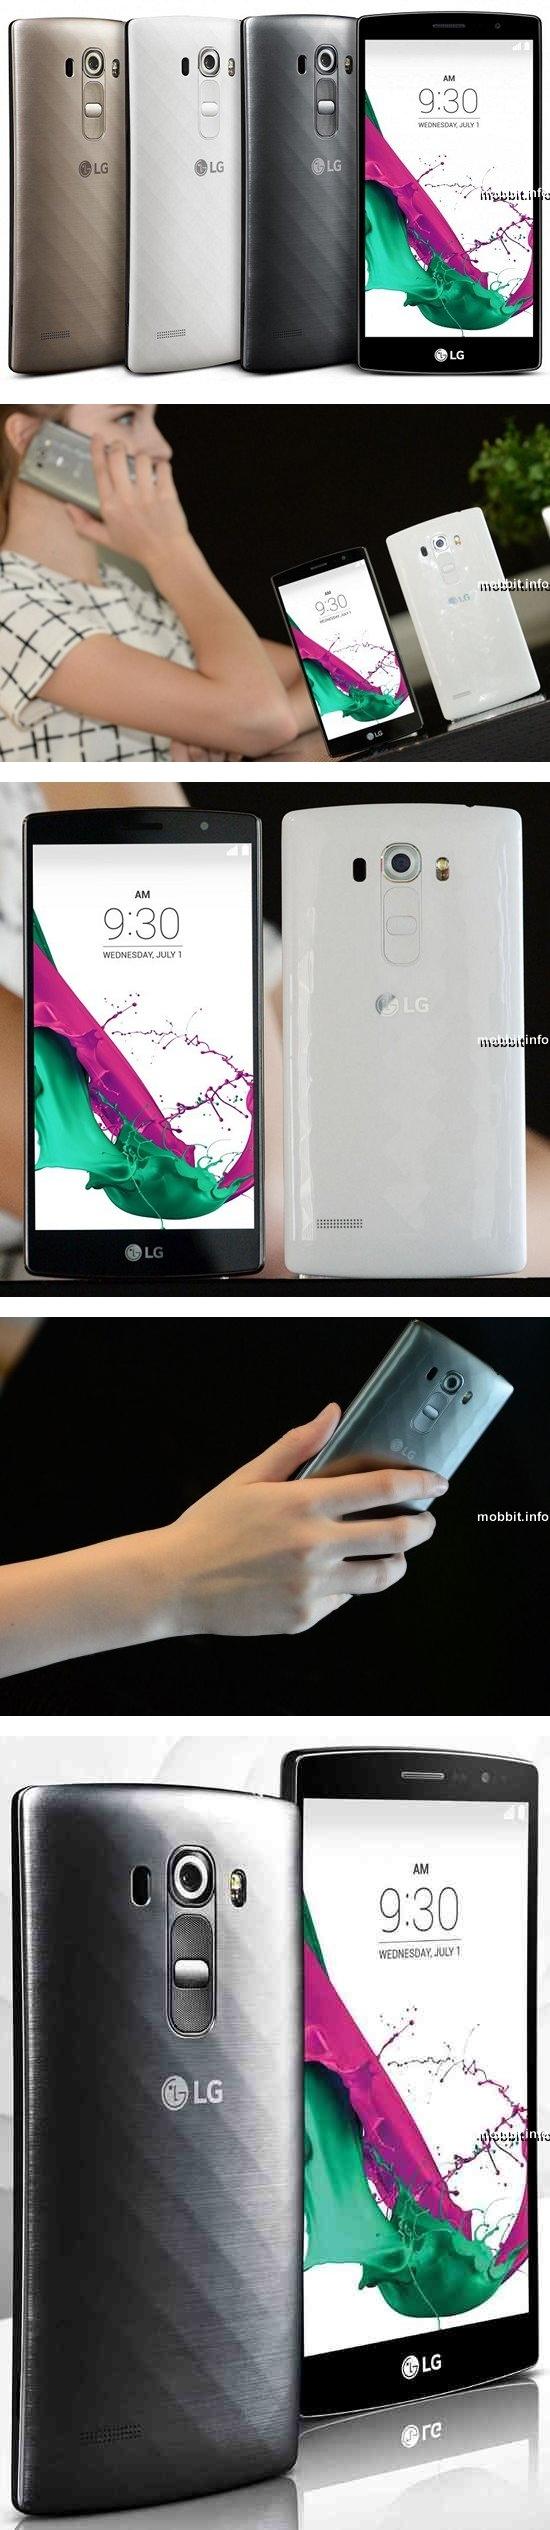 LG G4s